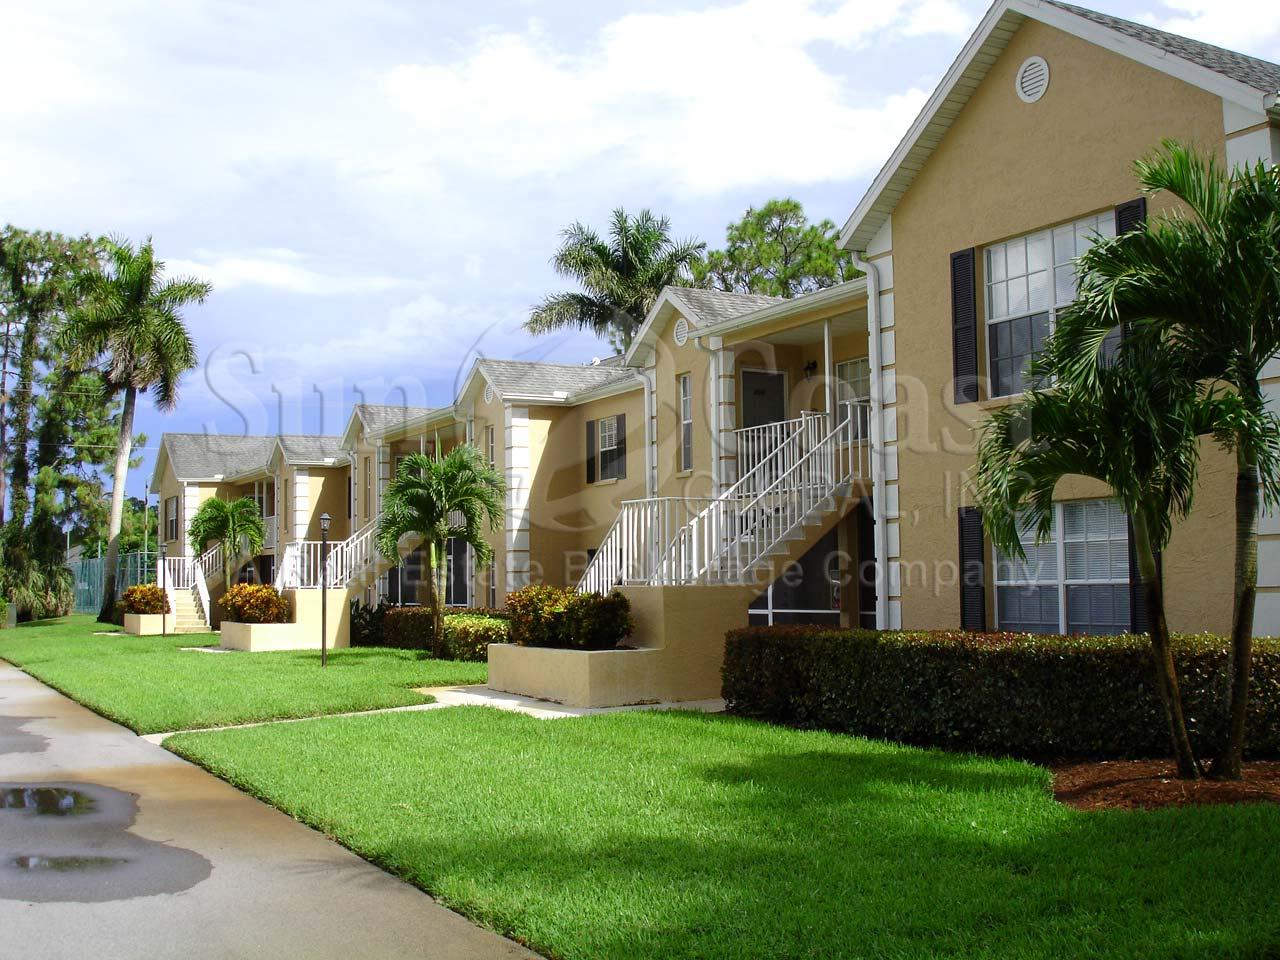 KINGWOOD GARDEN Real Estate NAPLES Florida Fla Fl